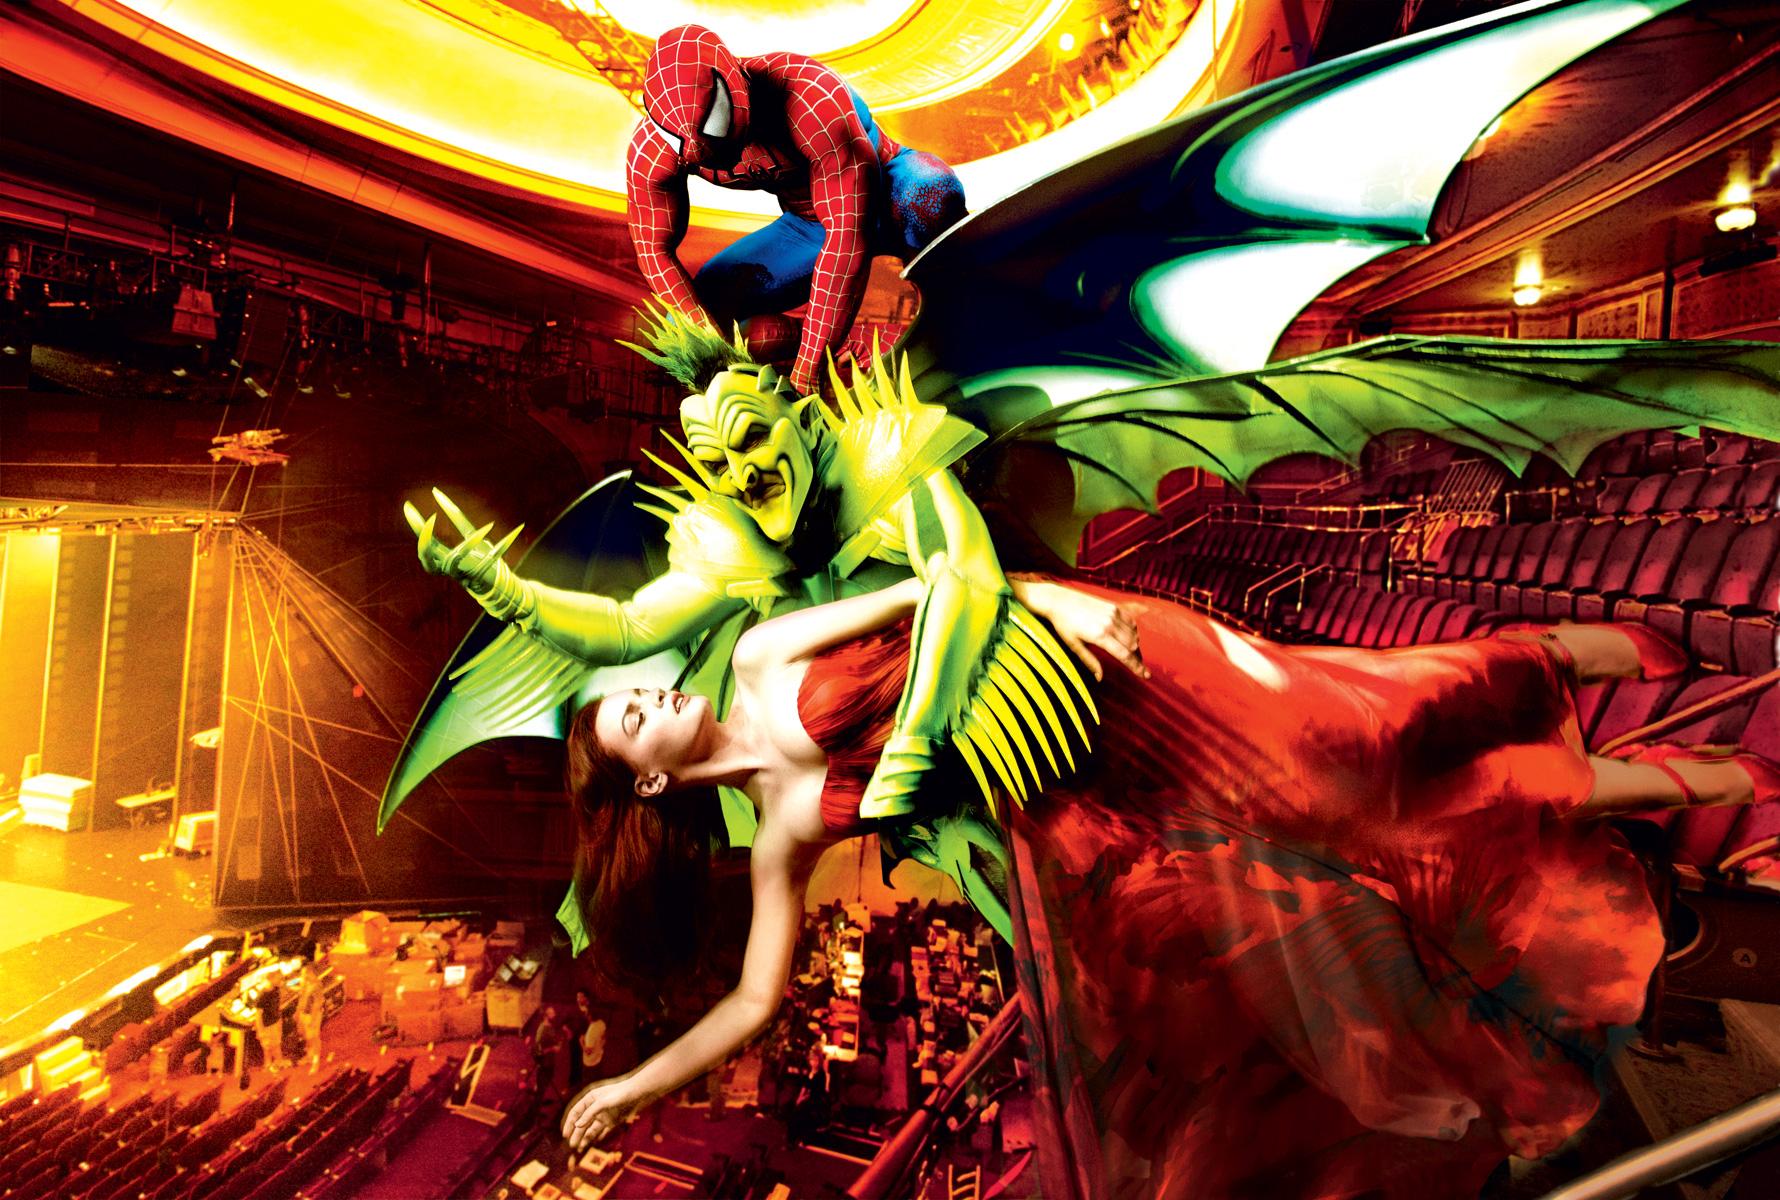 spidermanflyingoverseats